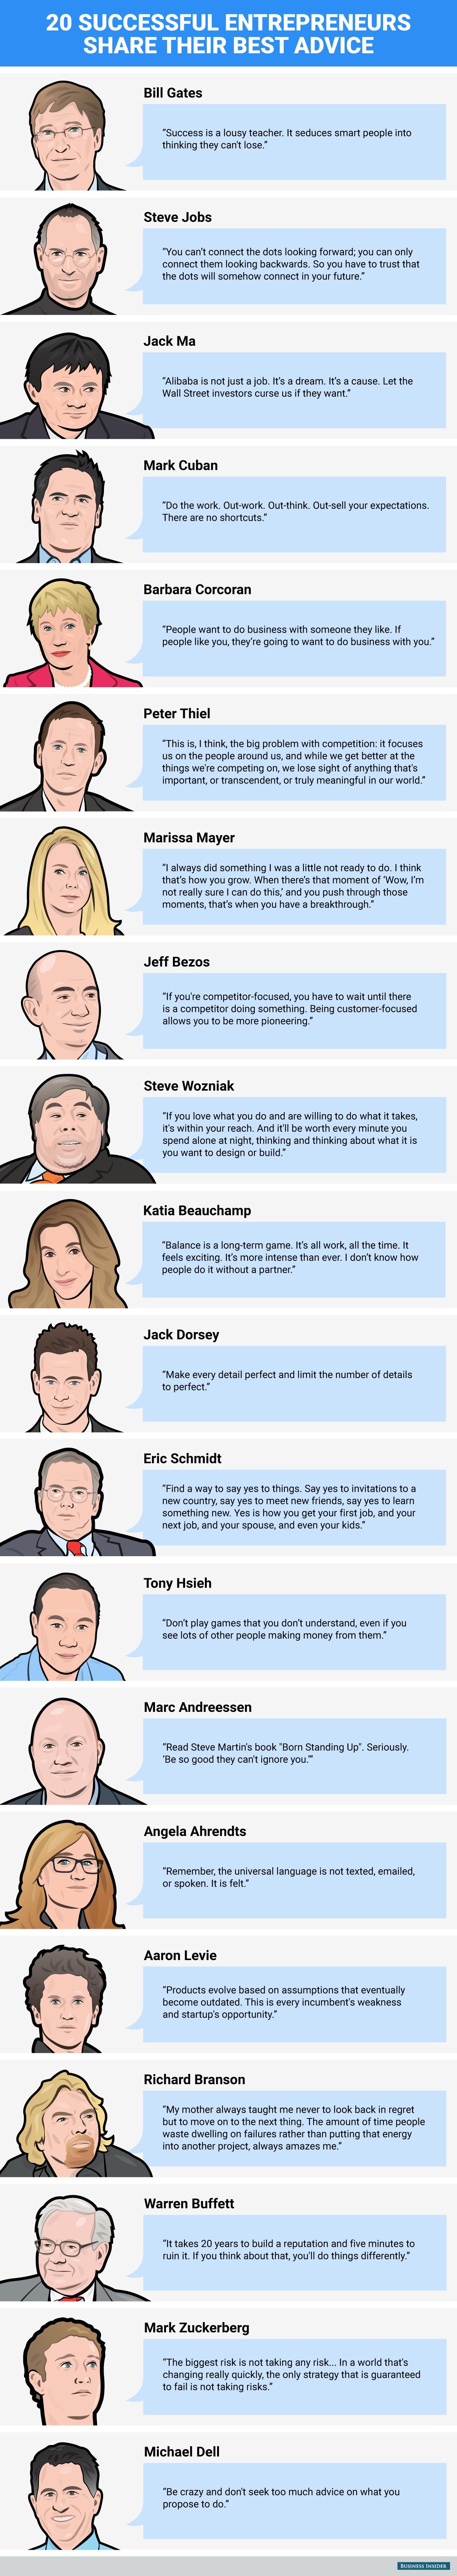 BI_Graphics_successful entrepreneurs best advice 2015